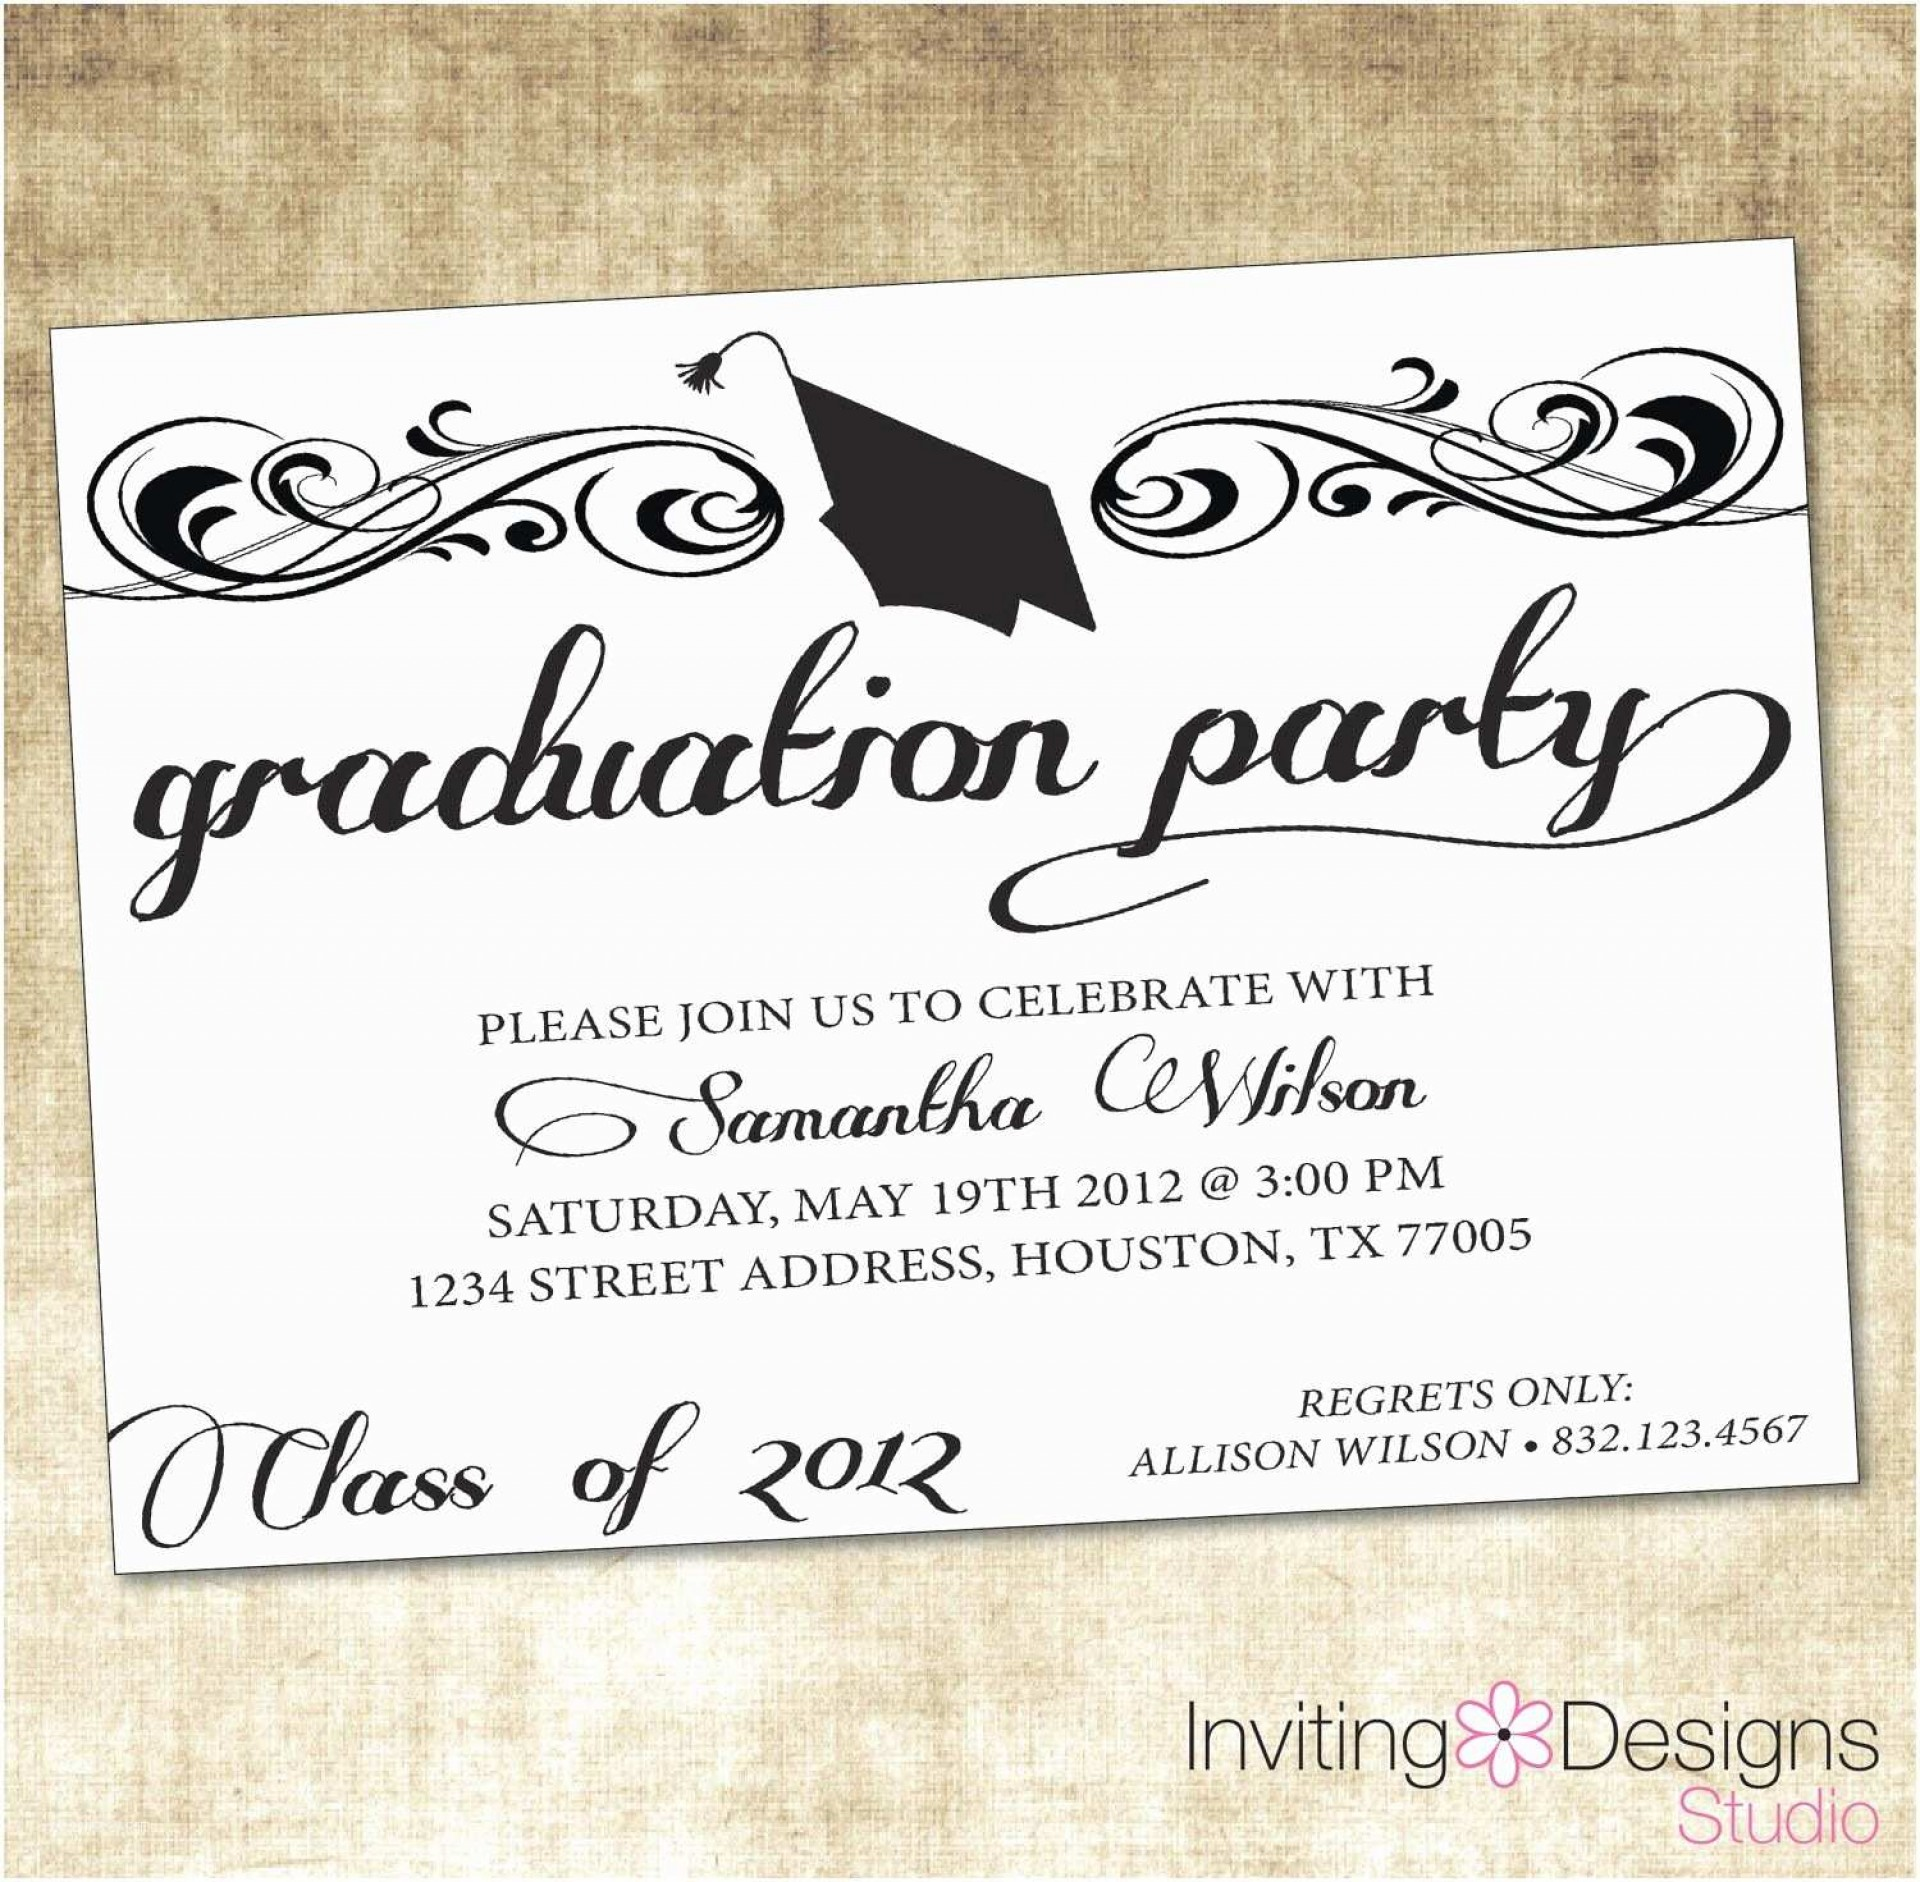 004 Astounding Graduation Party Invitation Template Design  Microsoft Word 4 Per Page1920